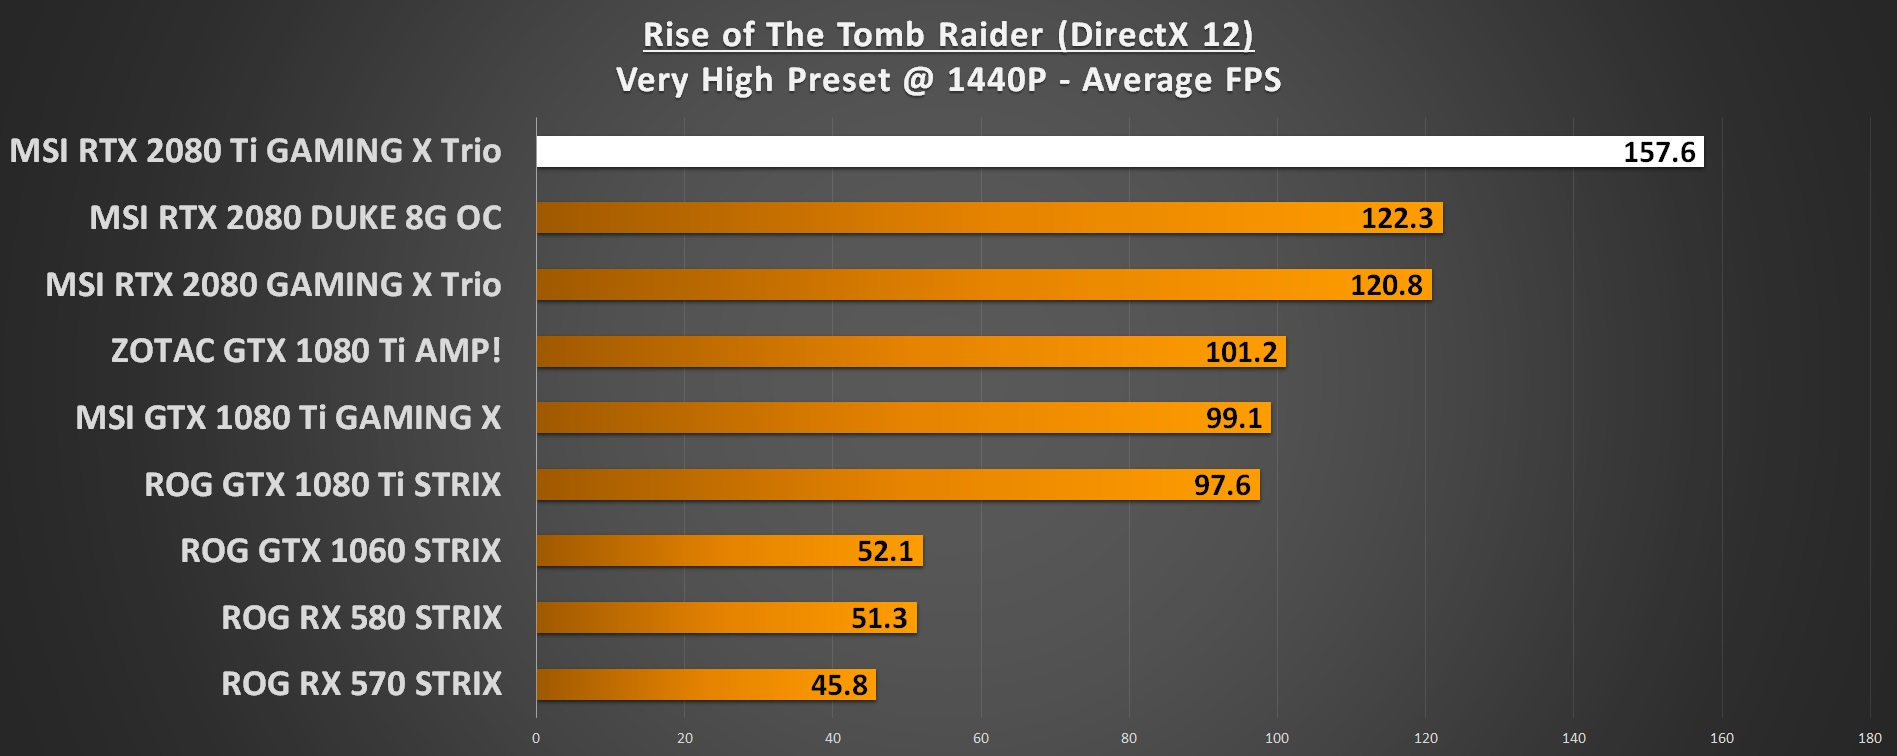 RoTR 1440p RTX 2080 Ti Performance